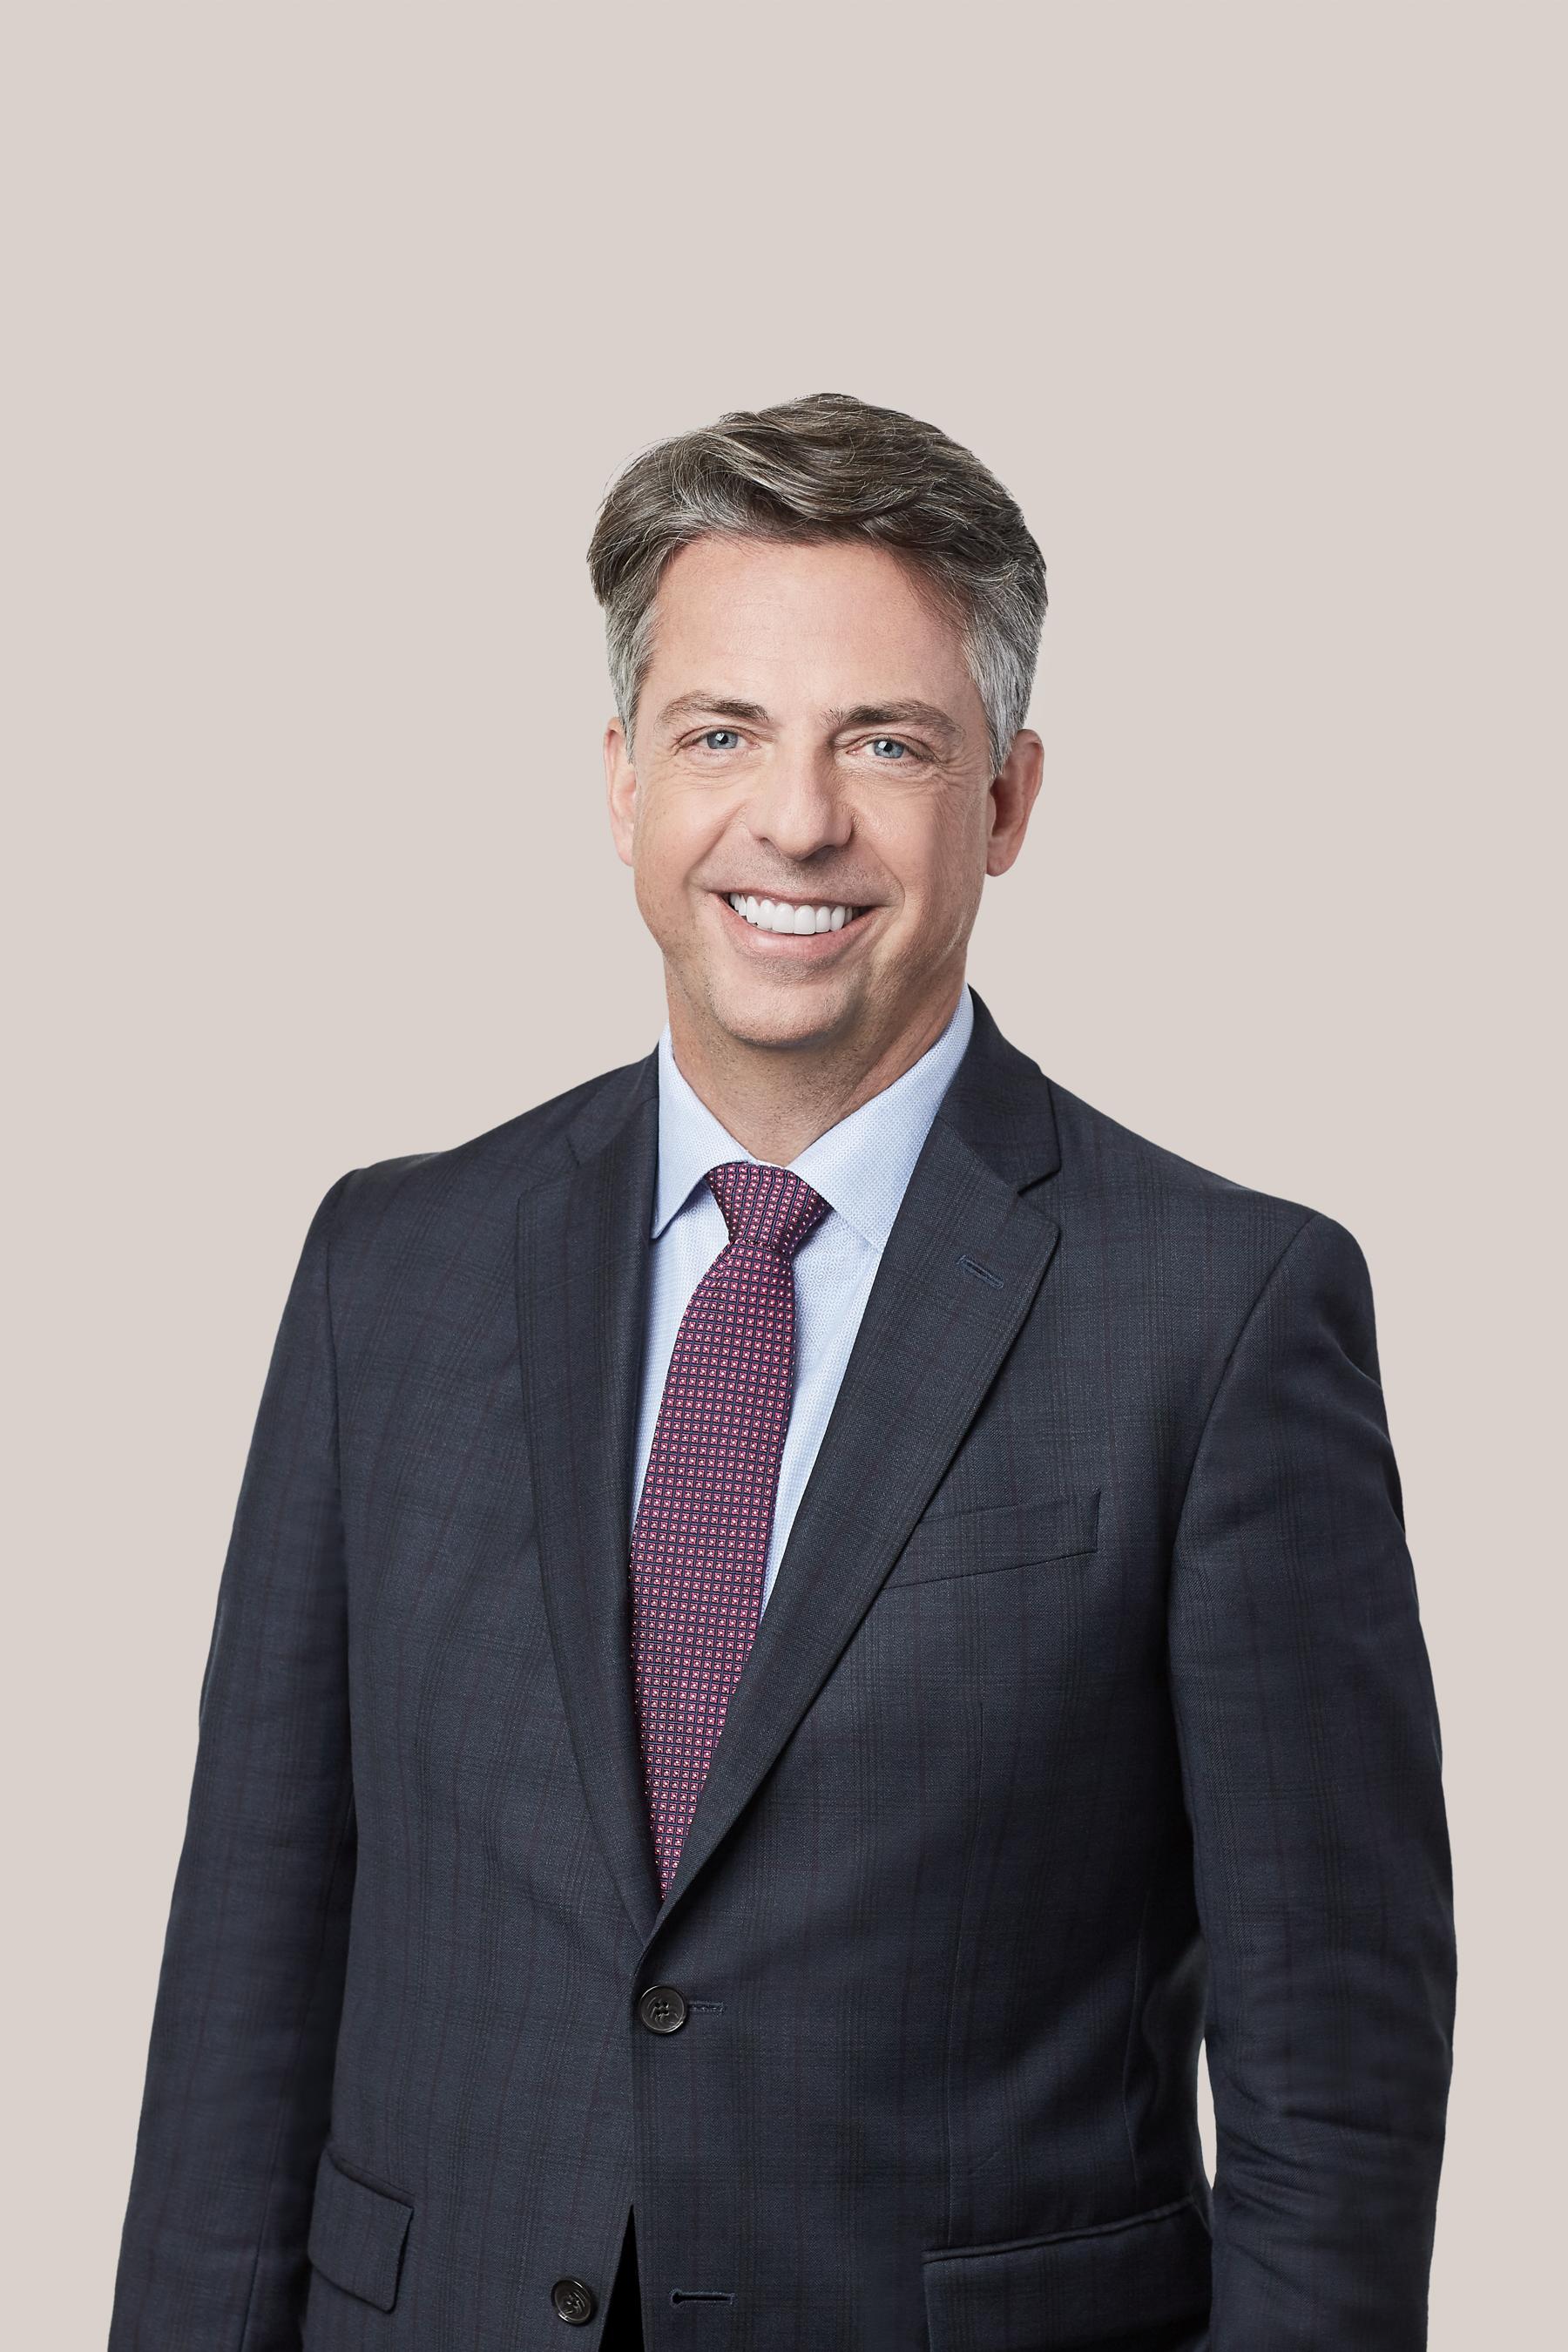 10887-andre-turmel-montreal-avocat-1